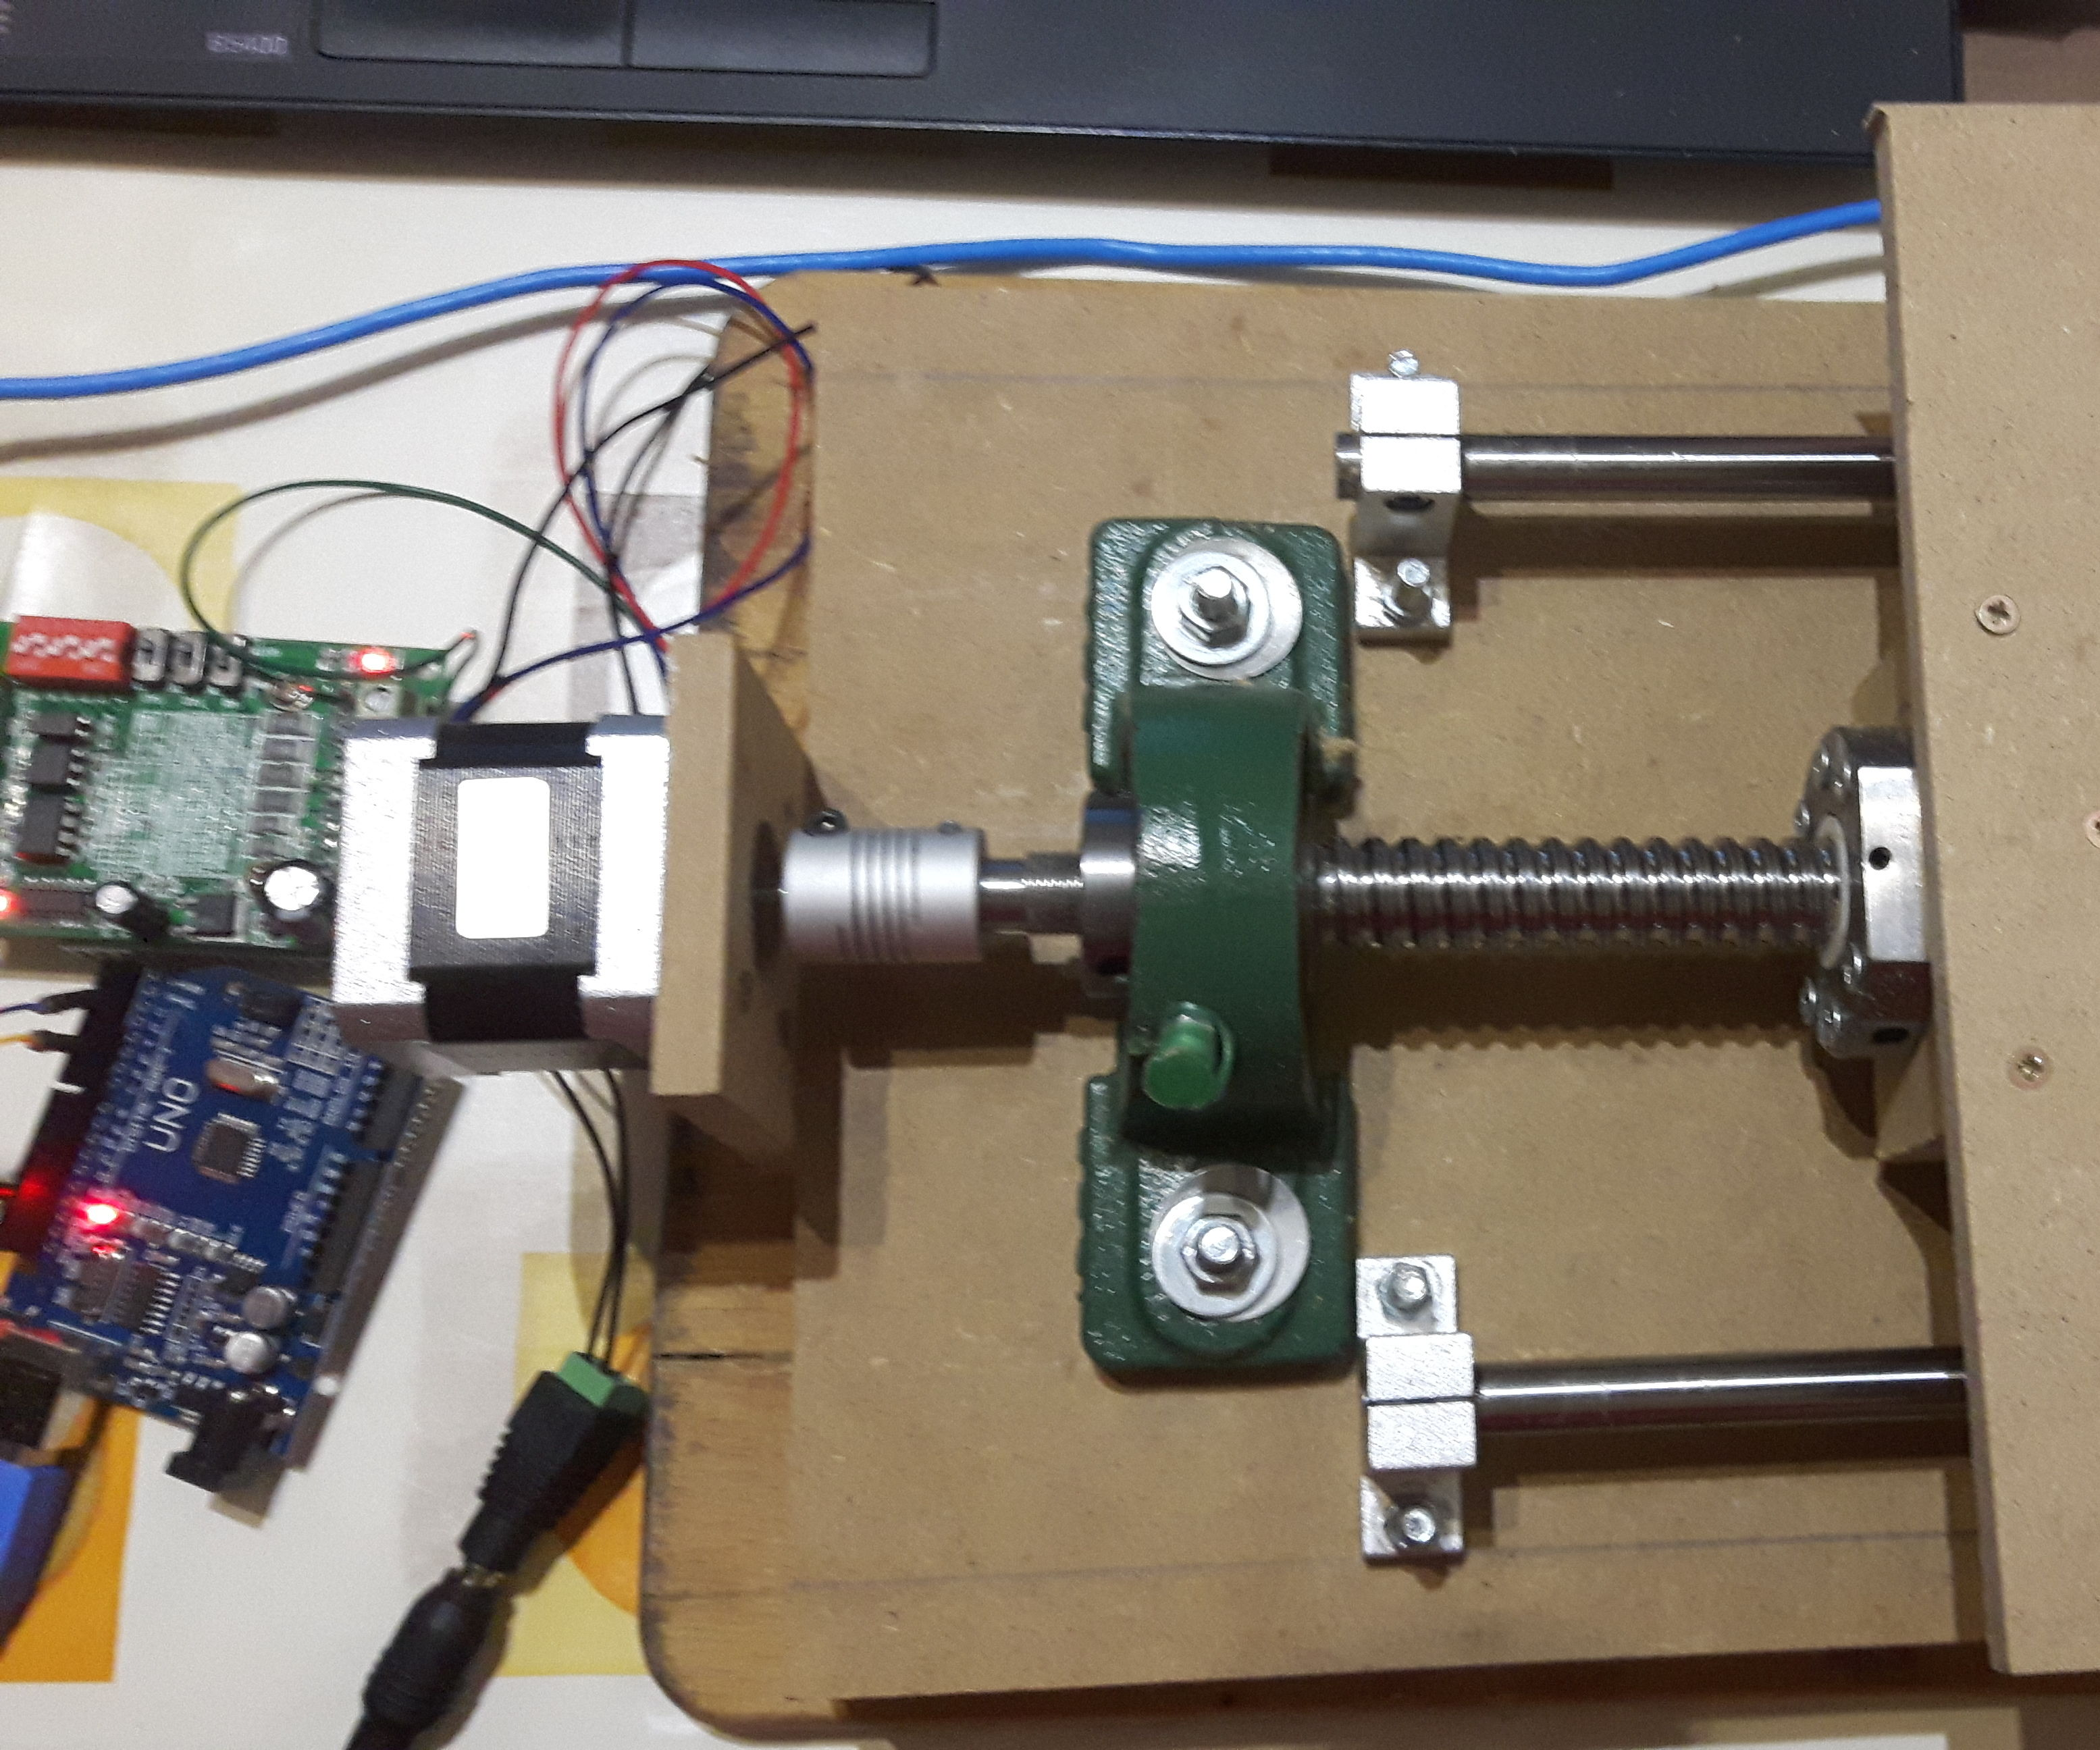 Homemade CNC milling machine v2 - arudino uno GRBL